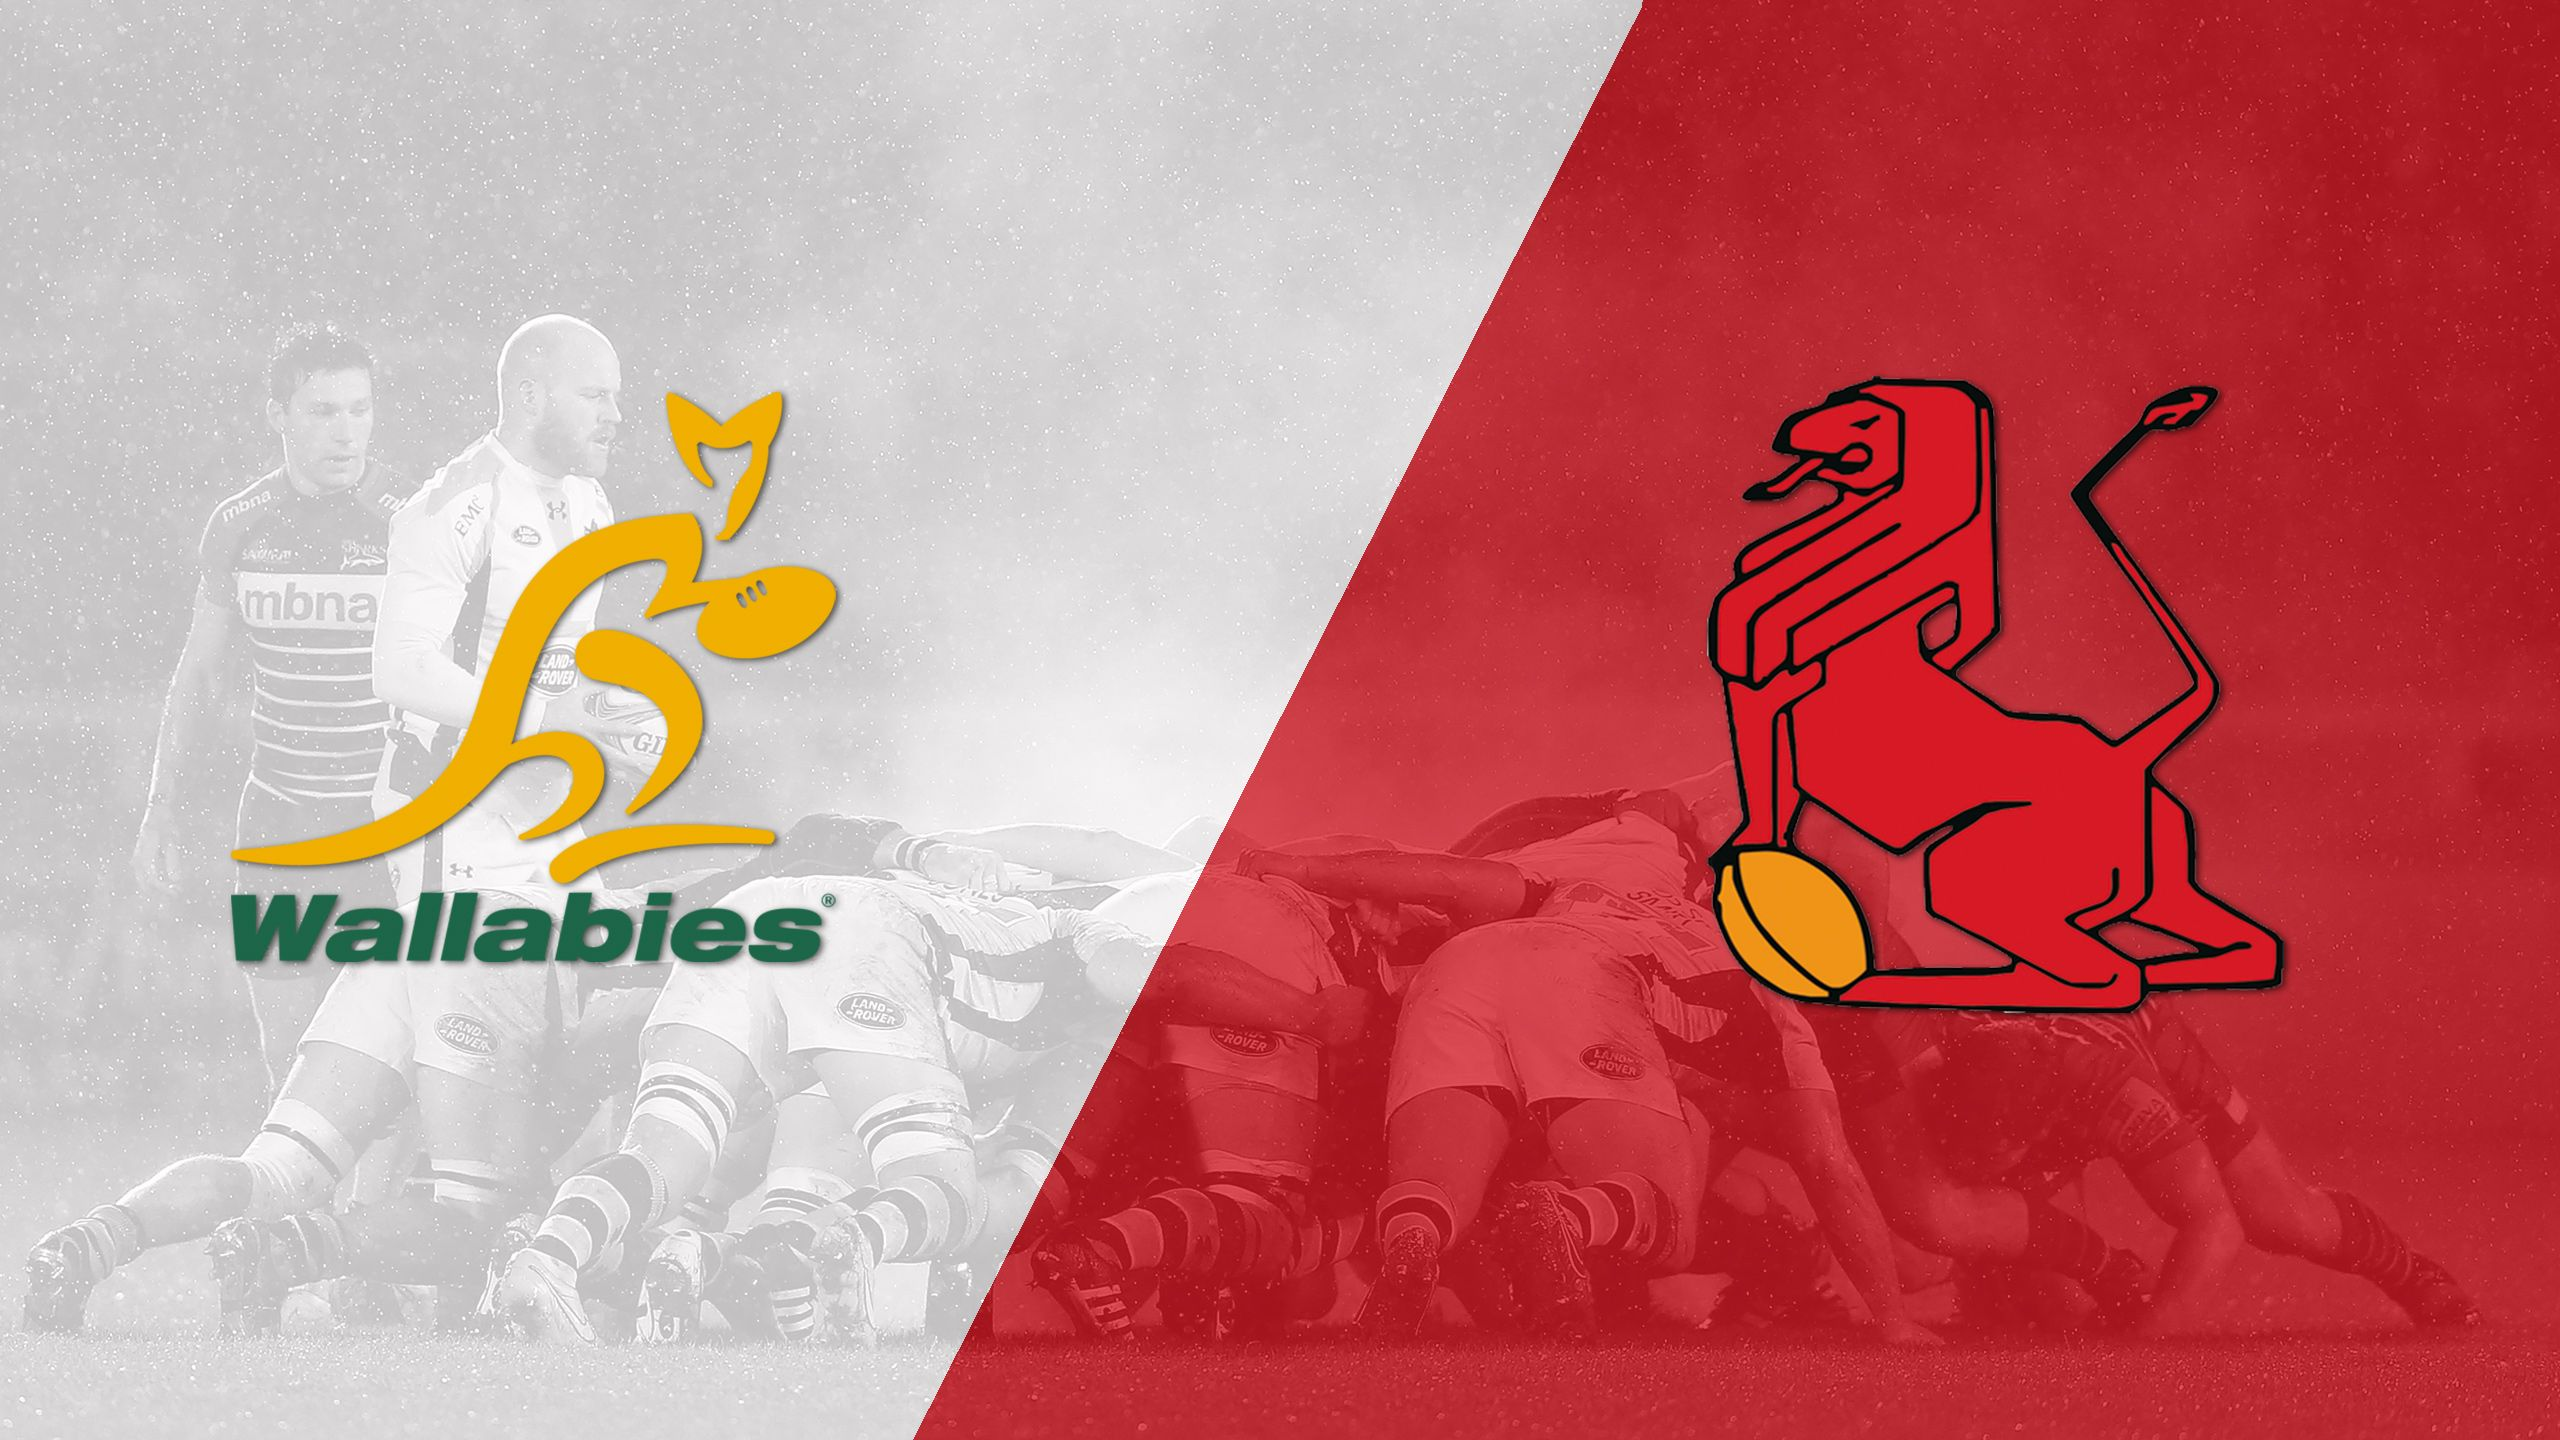 Australia vs. Spain (World Rugby Sevens Series)